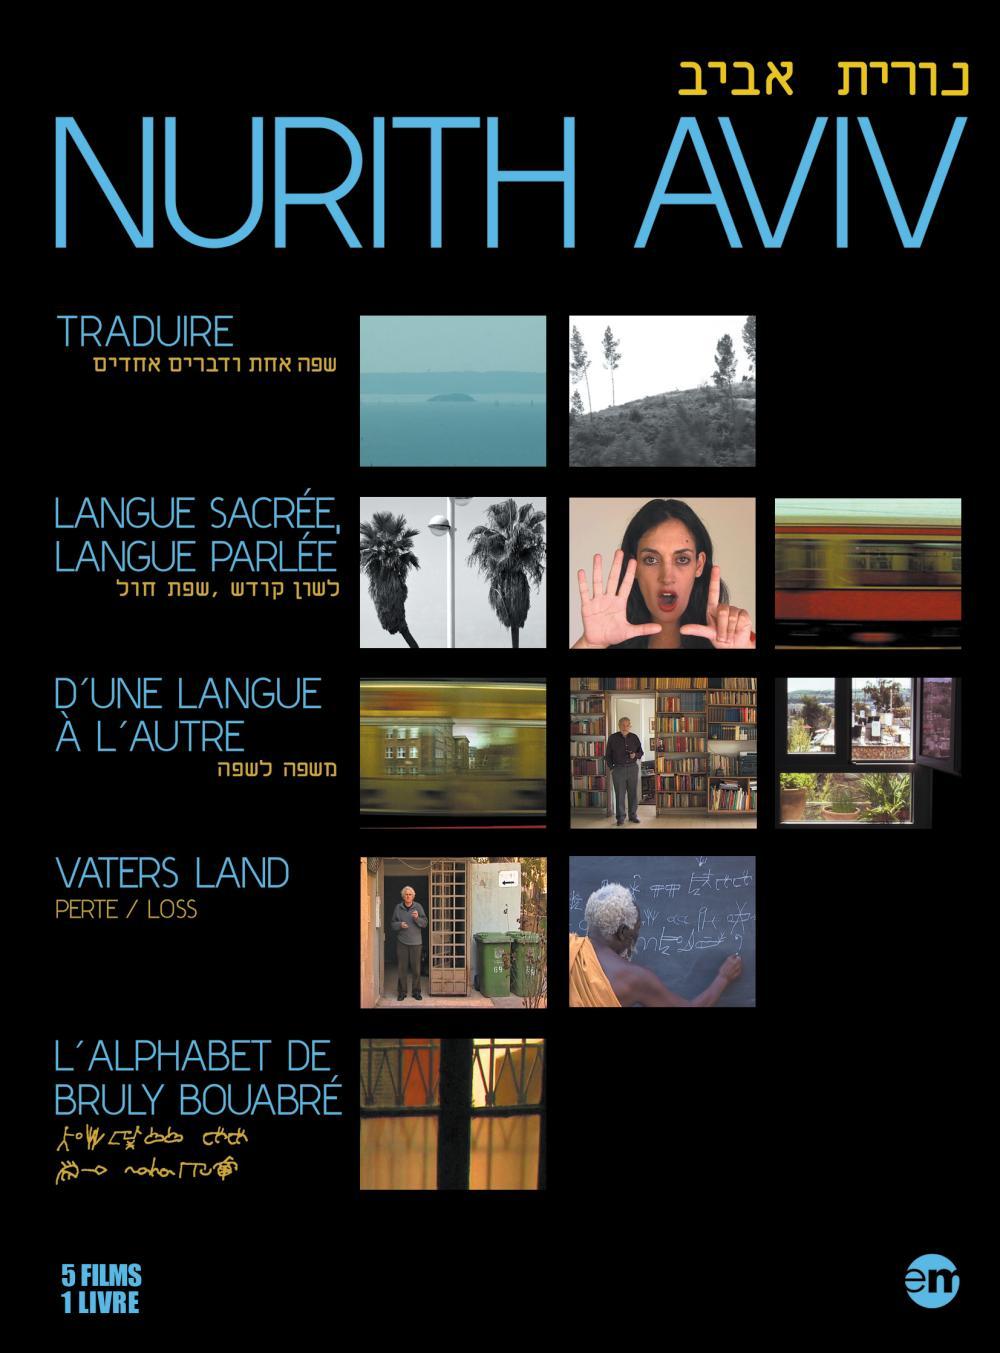 Coffret Nurith Aviv (5 Films)